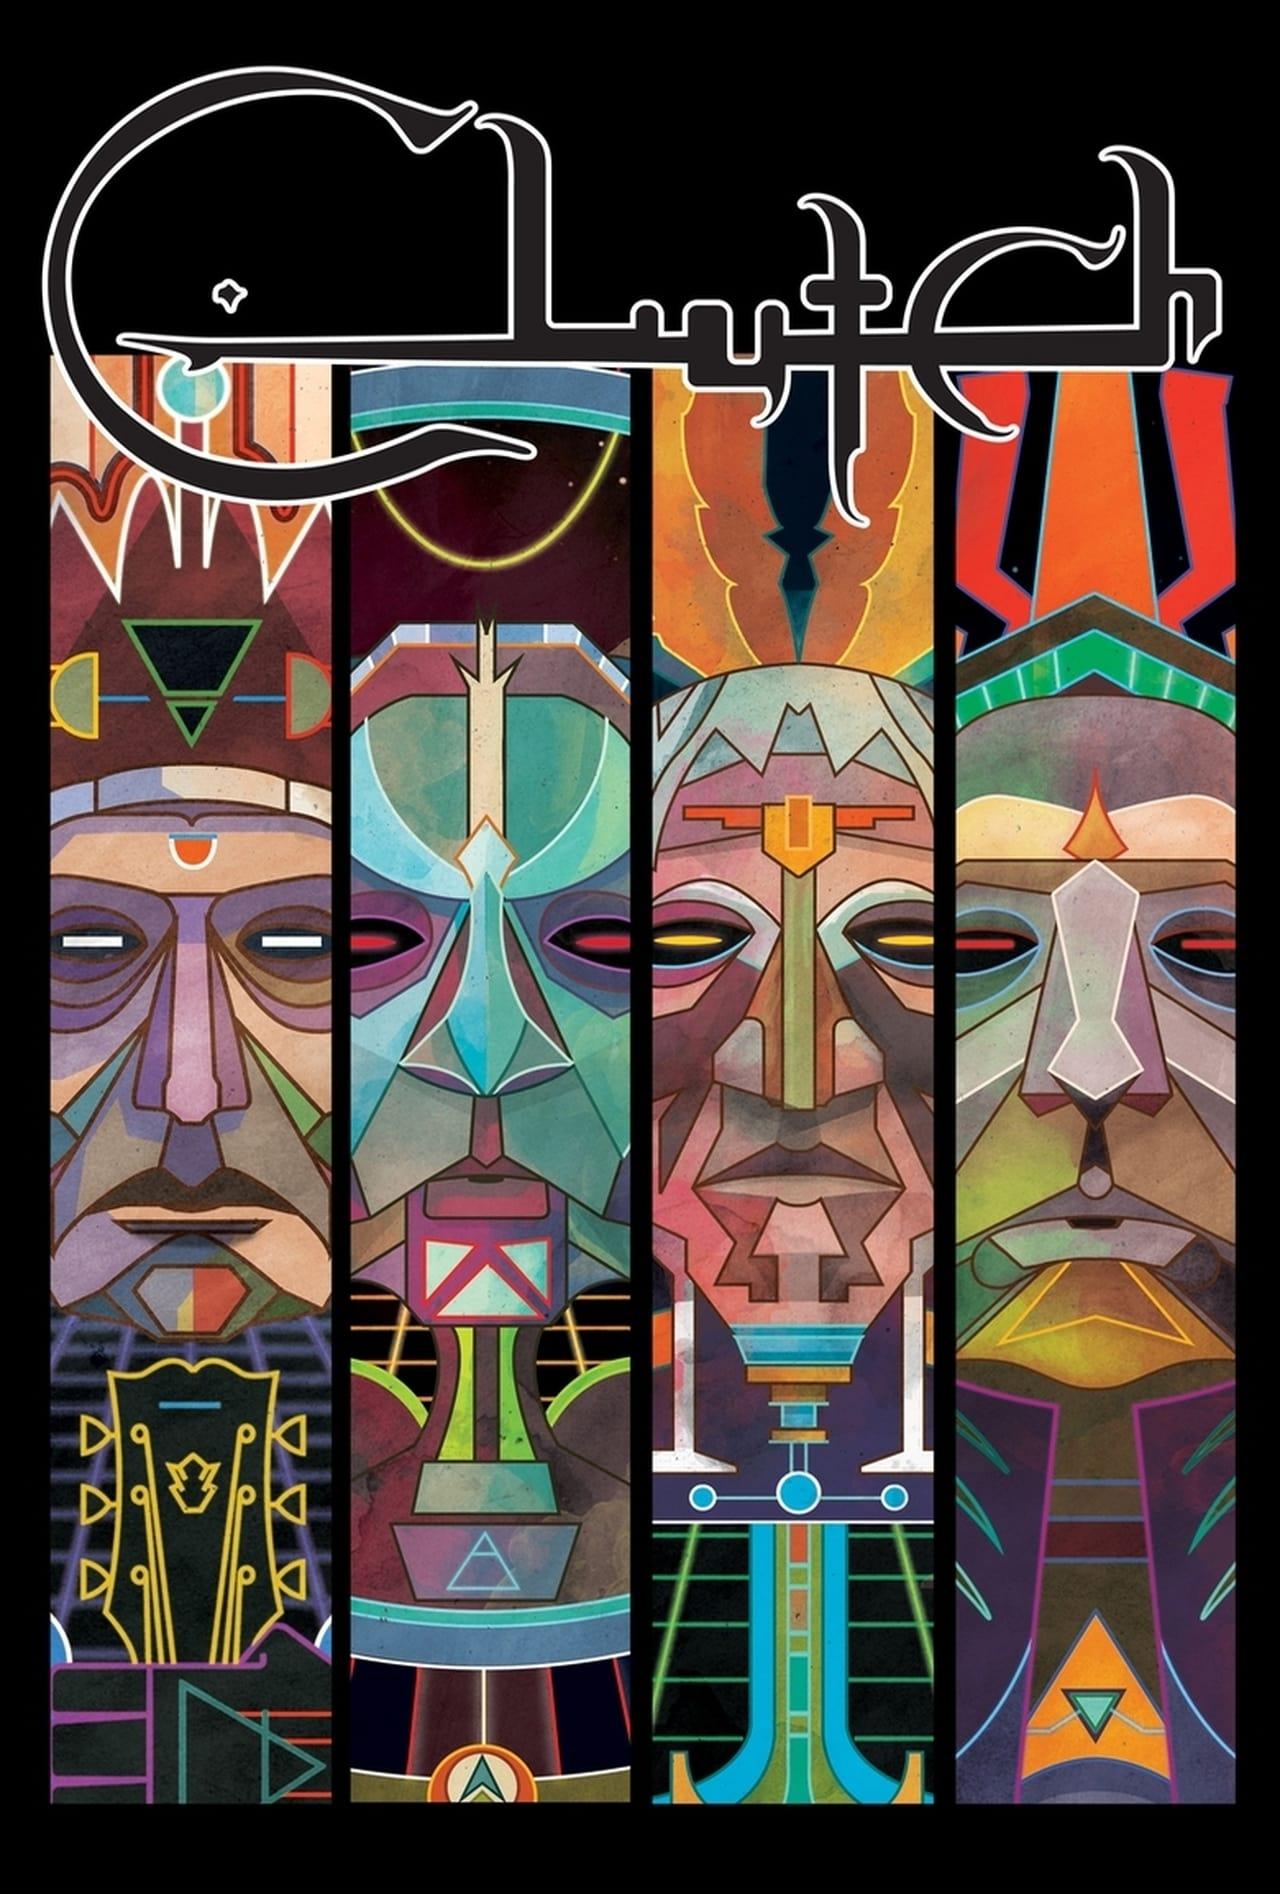 Clutch: Earth Rocker World Tour - Live in Denver (2013)